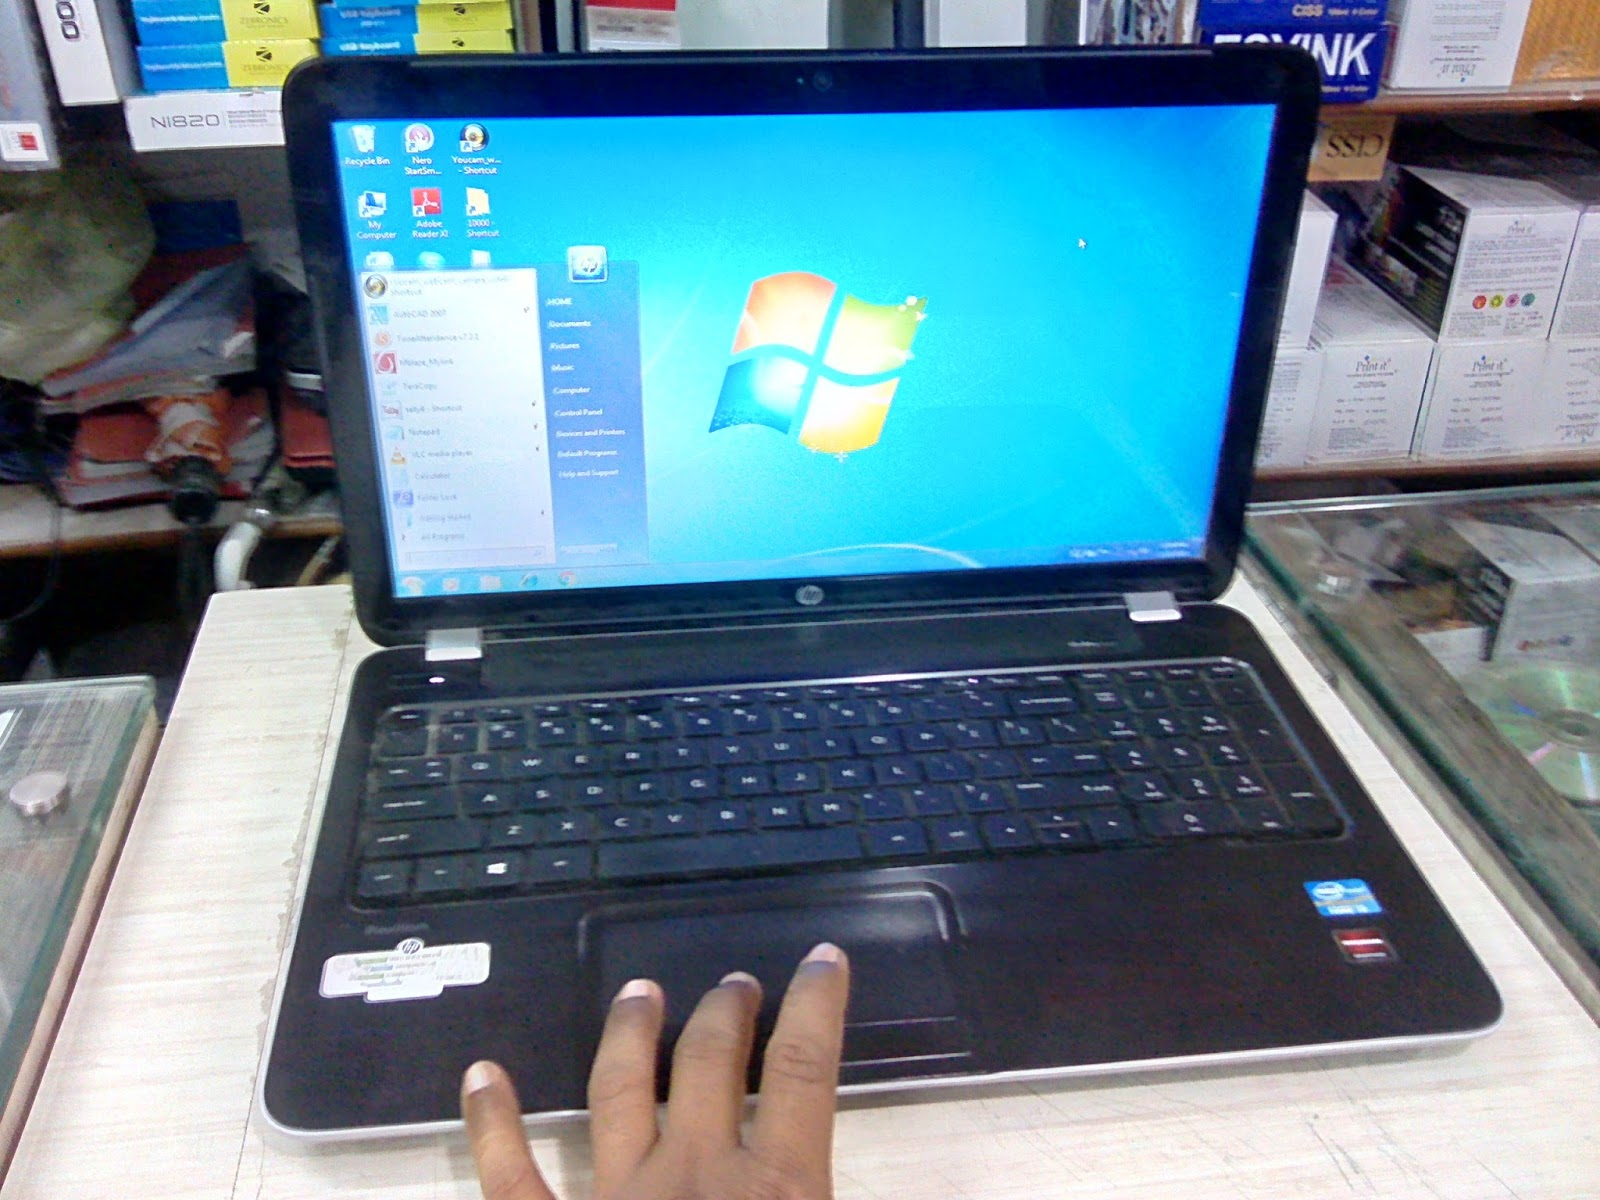 Learn New Things: HP Pavilion 15-N011TX Laptop (i3/4GB/500GB